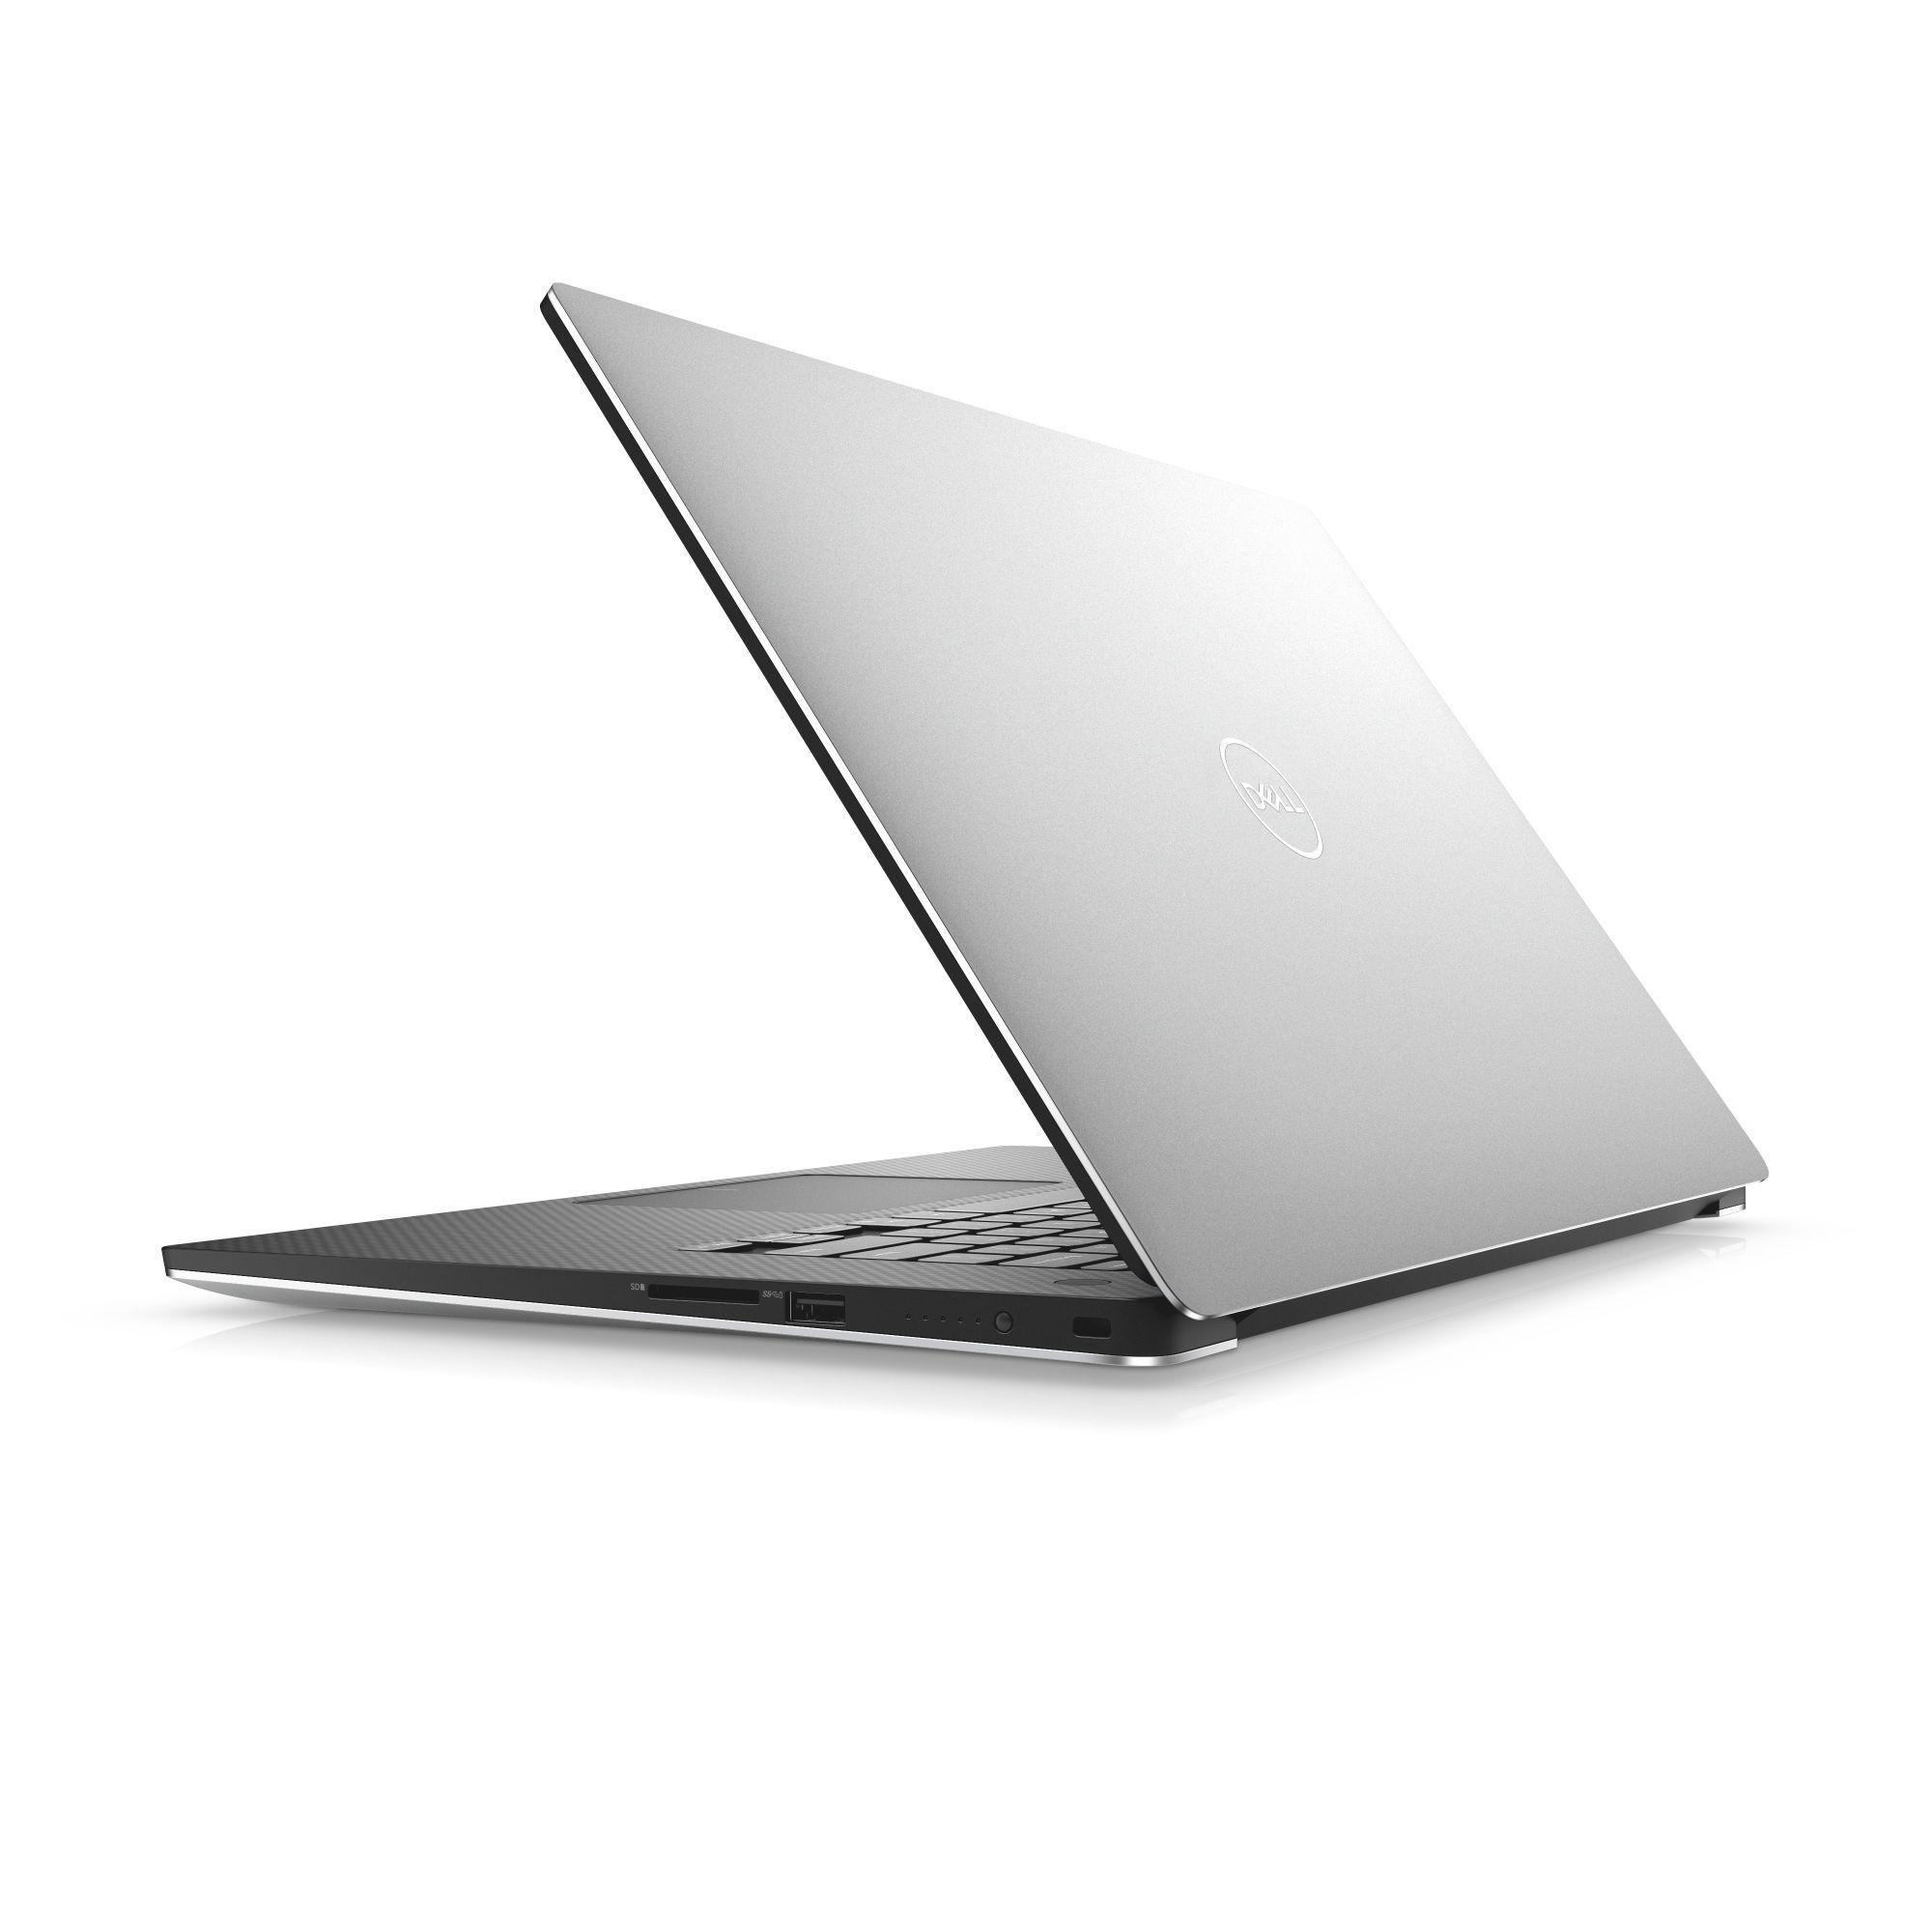 "Dell Precision 5530 15"" FHD i7-8850H/16GB/256GB SSD/P1000-4GB/THB/MCR/HDMI/W10P/3RNBD/Stříbrný"